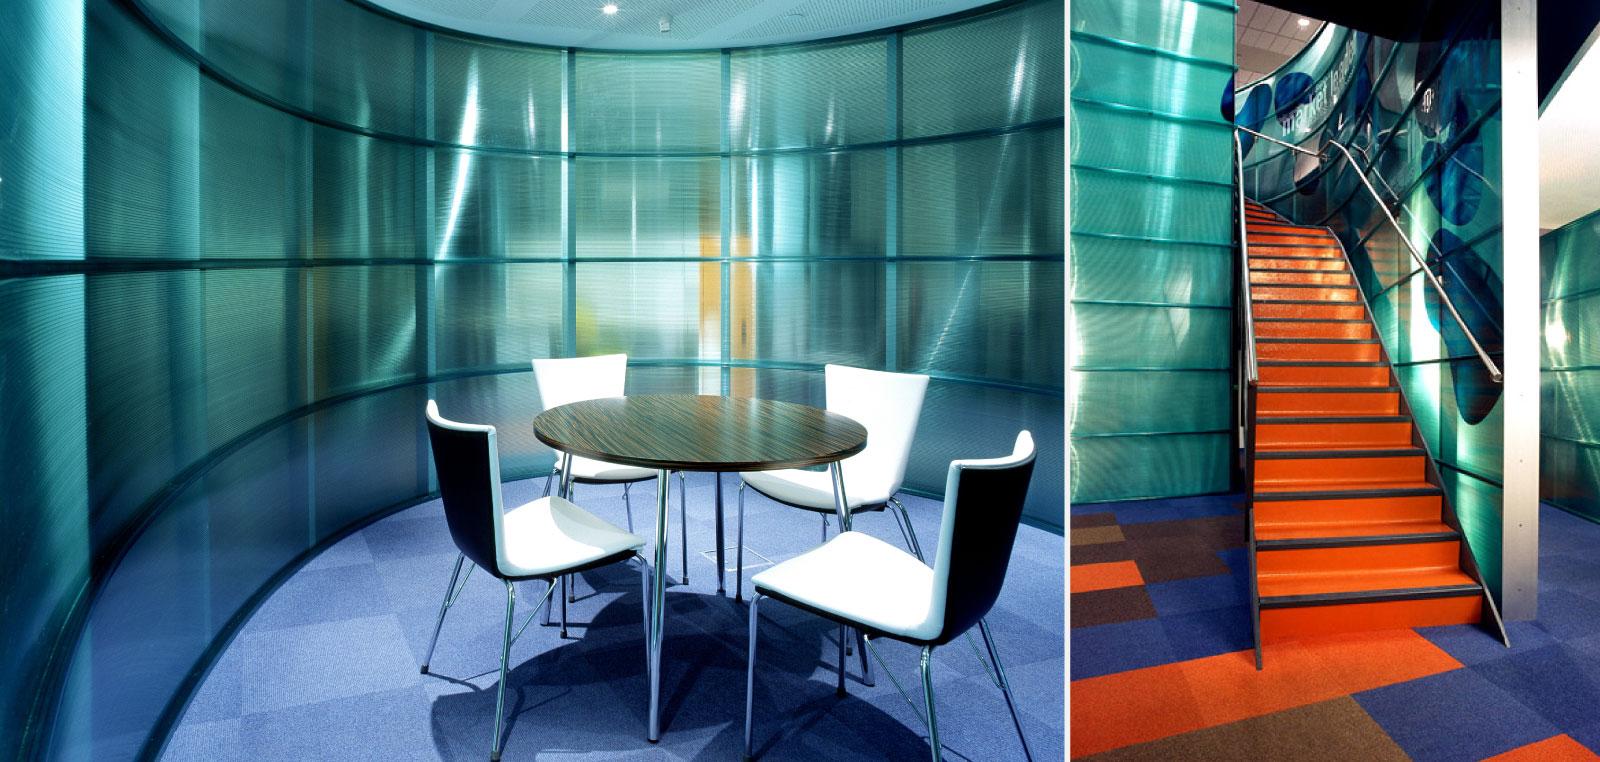 H2o-Architects-Melbourne-Australia-Post-Ground-Up-02